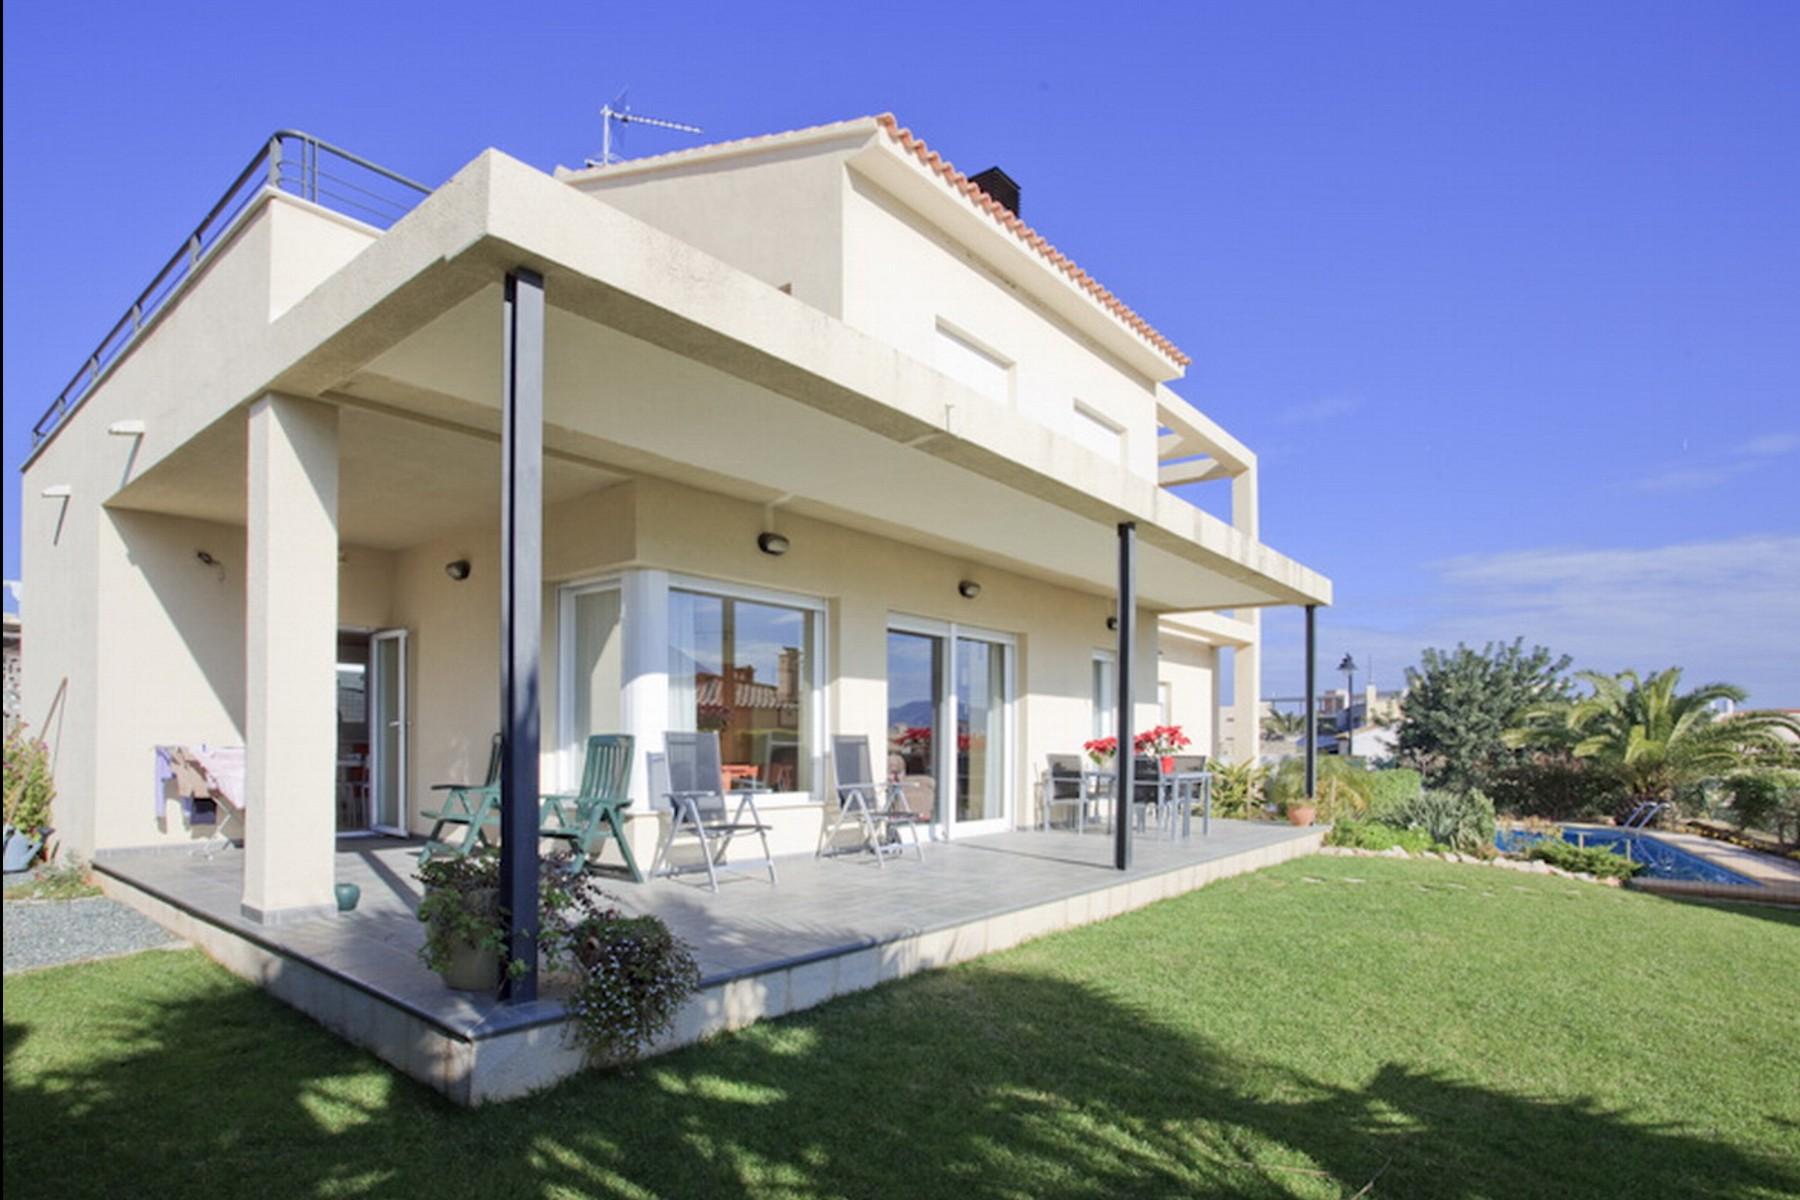 Imaginarq-152-Vivienda-unifamiliar-Pego-Alicante-13A